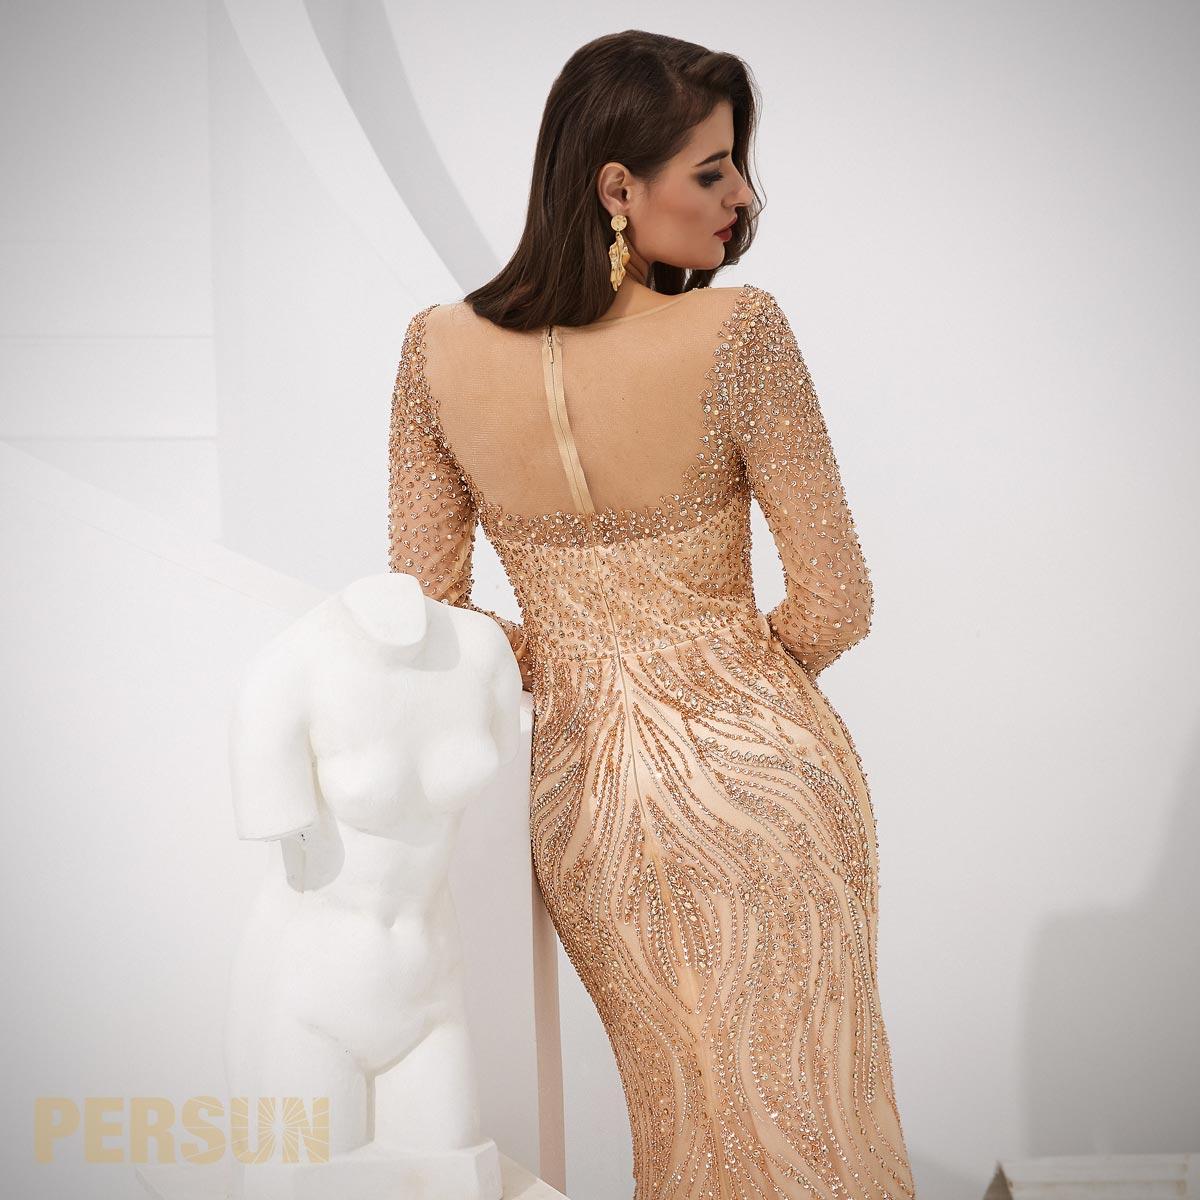 robe sirène cérémonie dorée champagne ornée de strass dos avec jeu de transparence